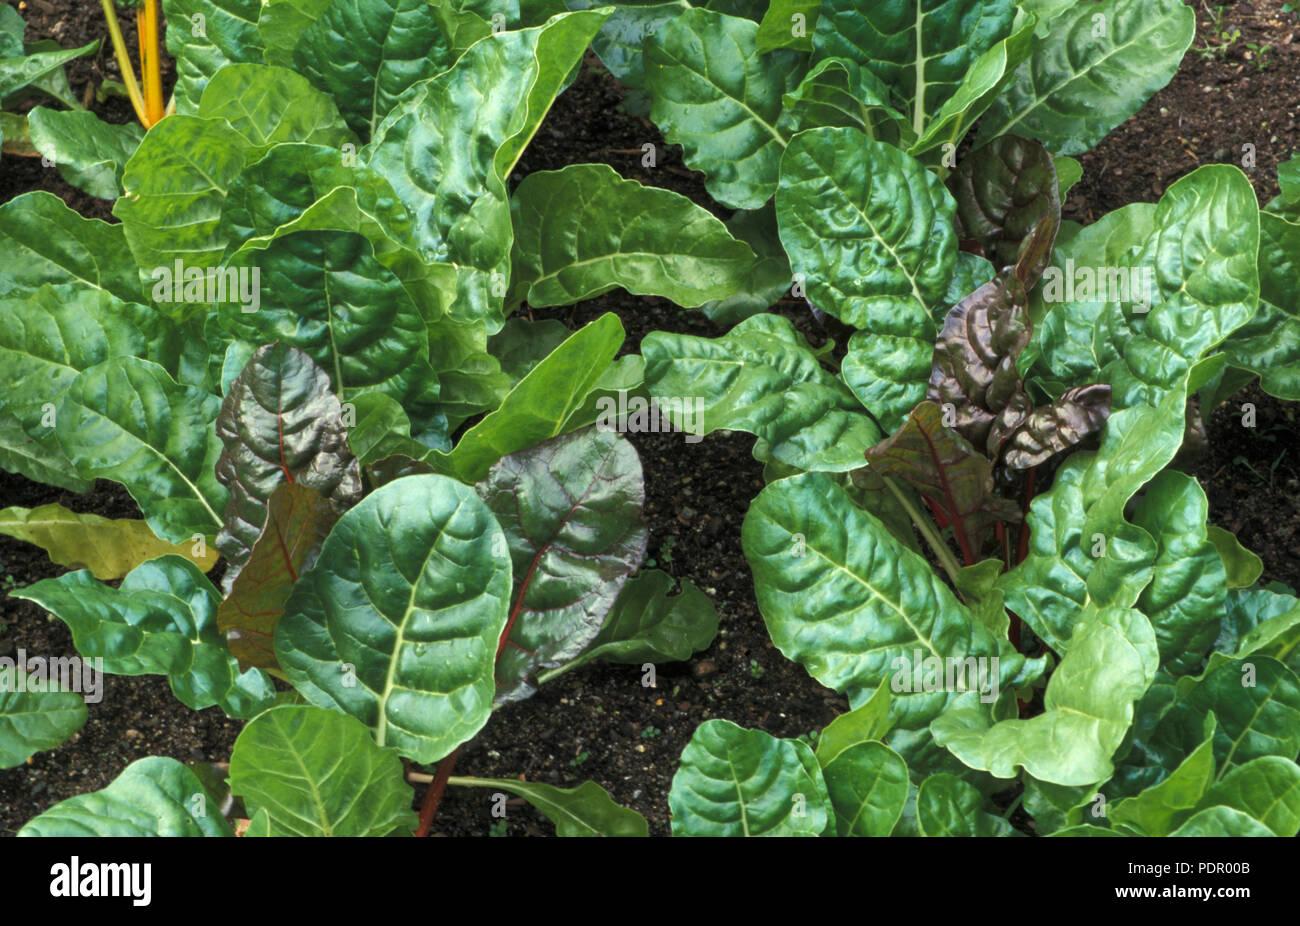 RAINBOW CHARD (SILVERBEET) BETA VULGARIS SSP. CICLA. GROWING - Stock Image